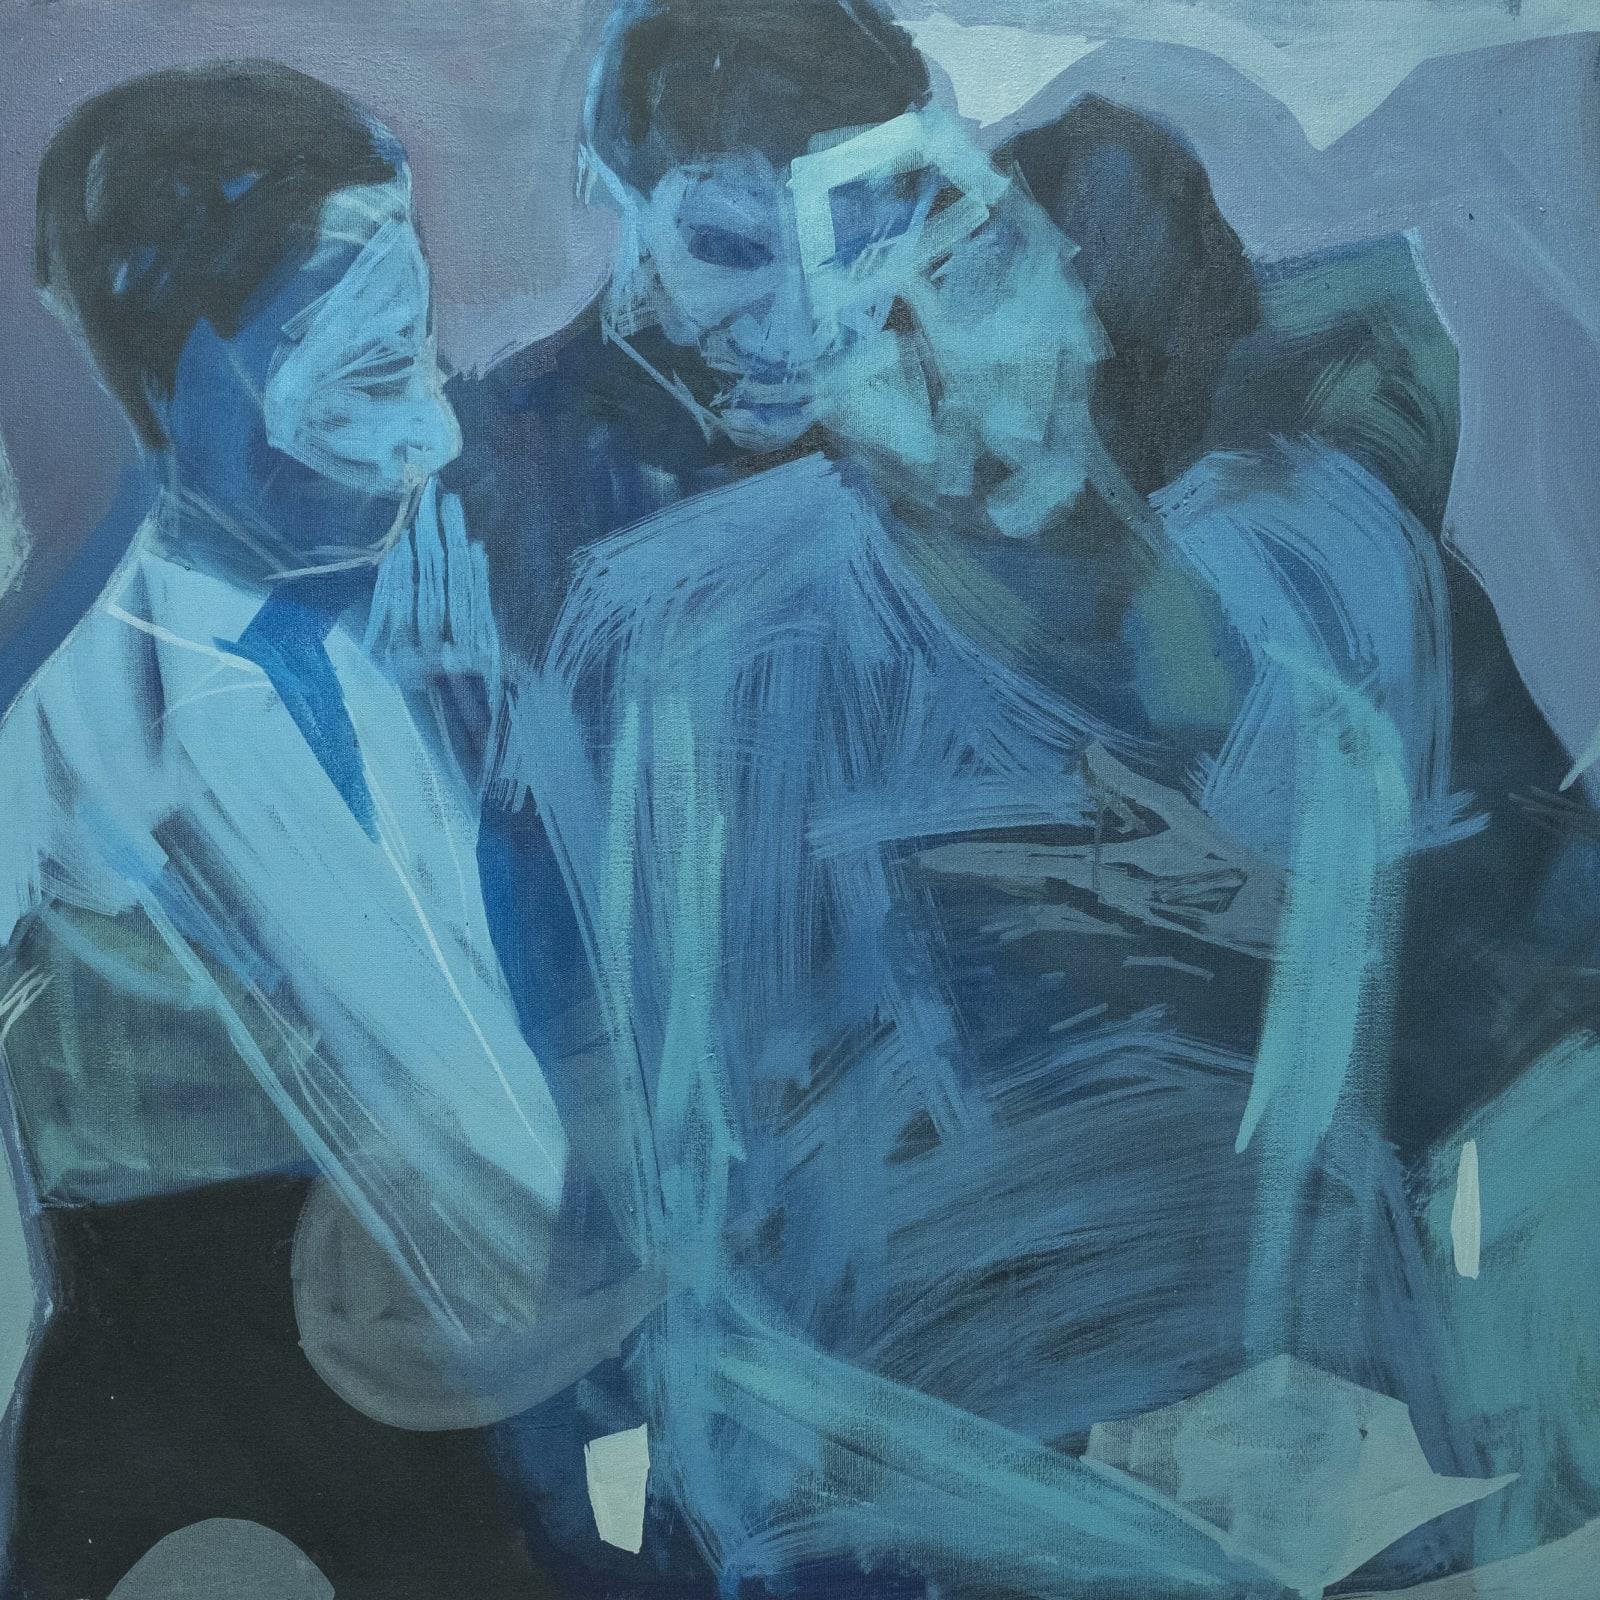 Tizta Berhanu, Love is Common Among Three, 2019